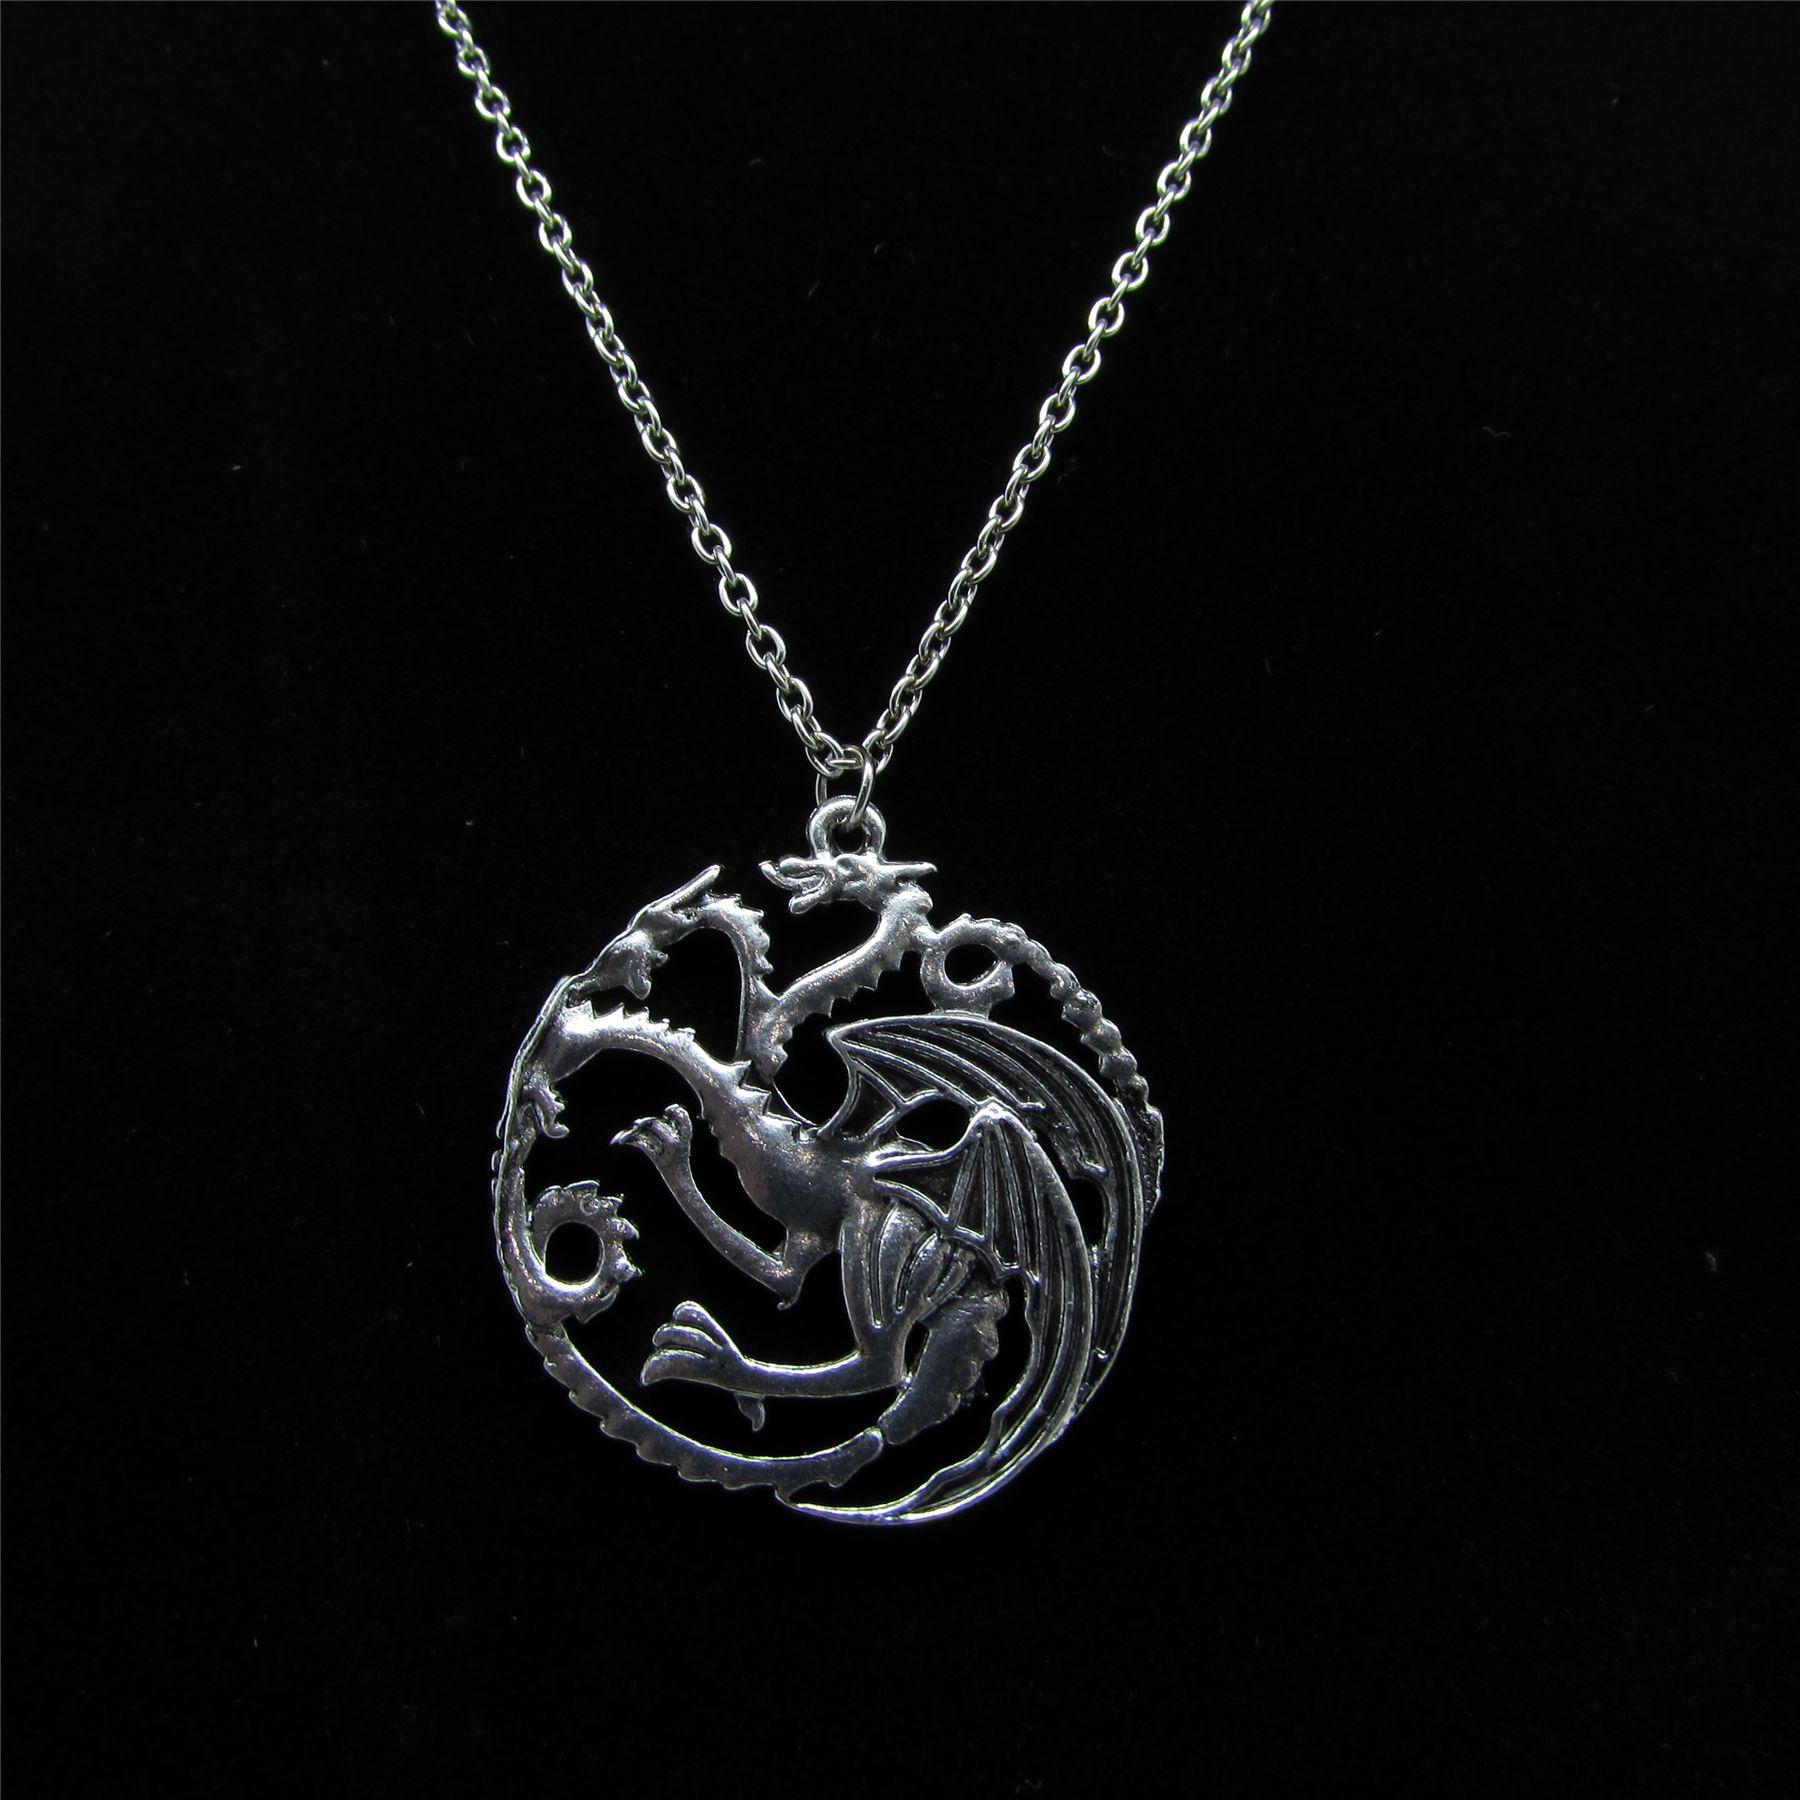 Game of Thrones Targaryen DRAGON Inspired Necklace Pendant NEW UK STOCK